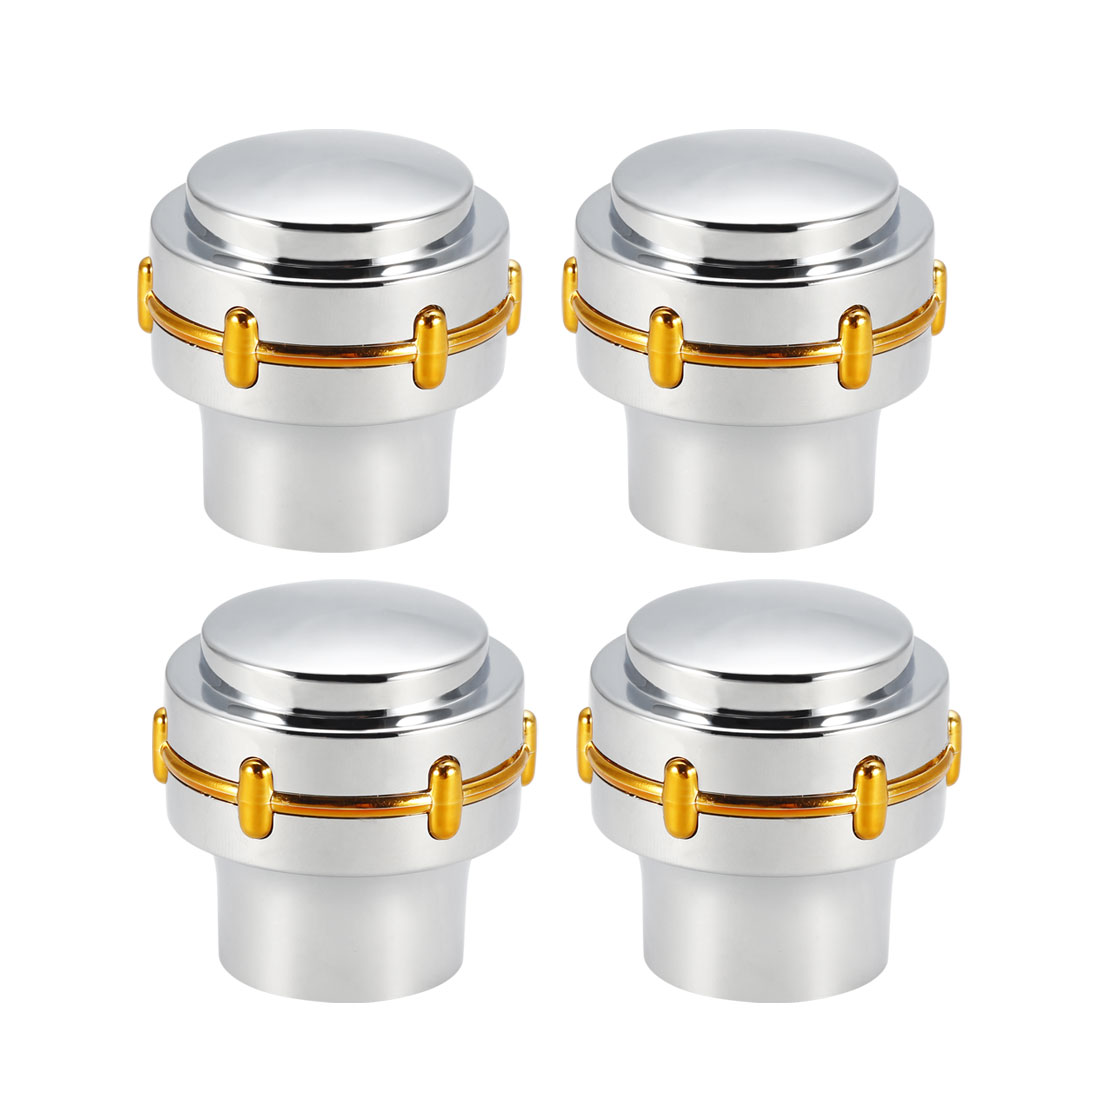 Faucet Knob Handle 33mm Dia Universal Replacement Handle Kit Silver Tone 4 Pcs